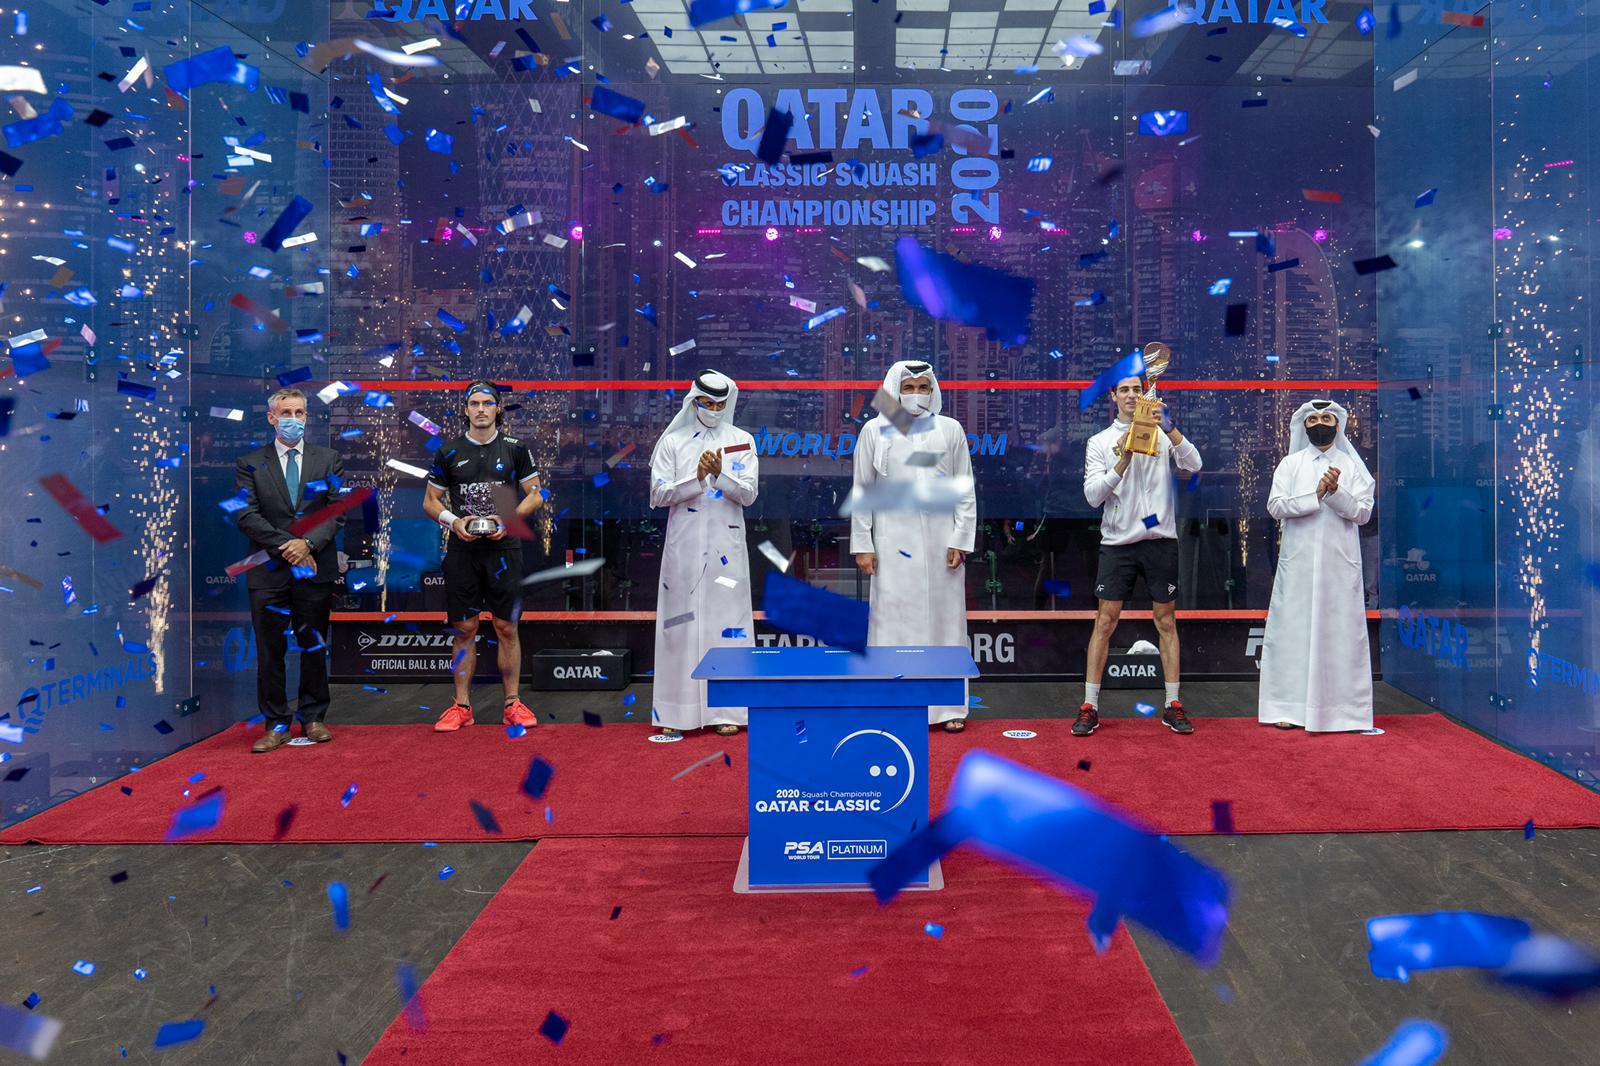 Sheikh Joaan Crowns Egypt's Ali Farag Champion of Qatar Classic 2020